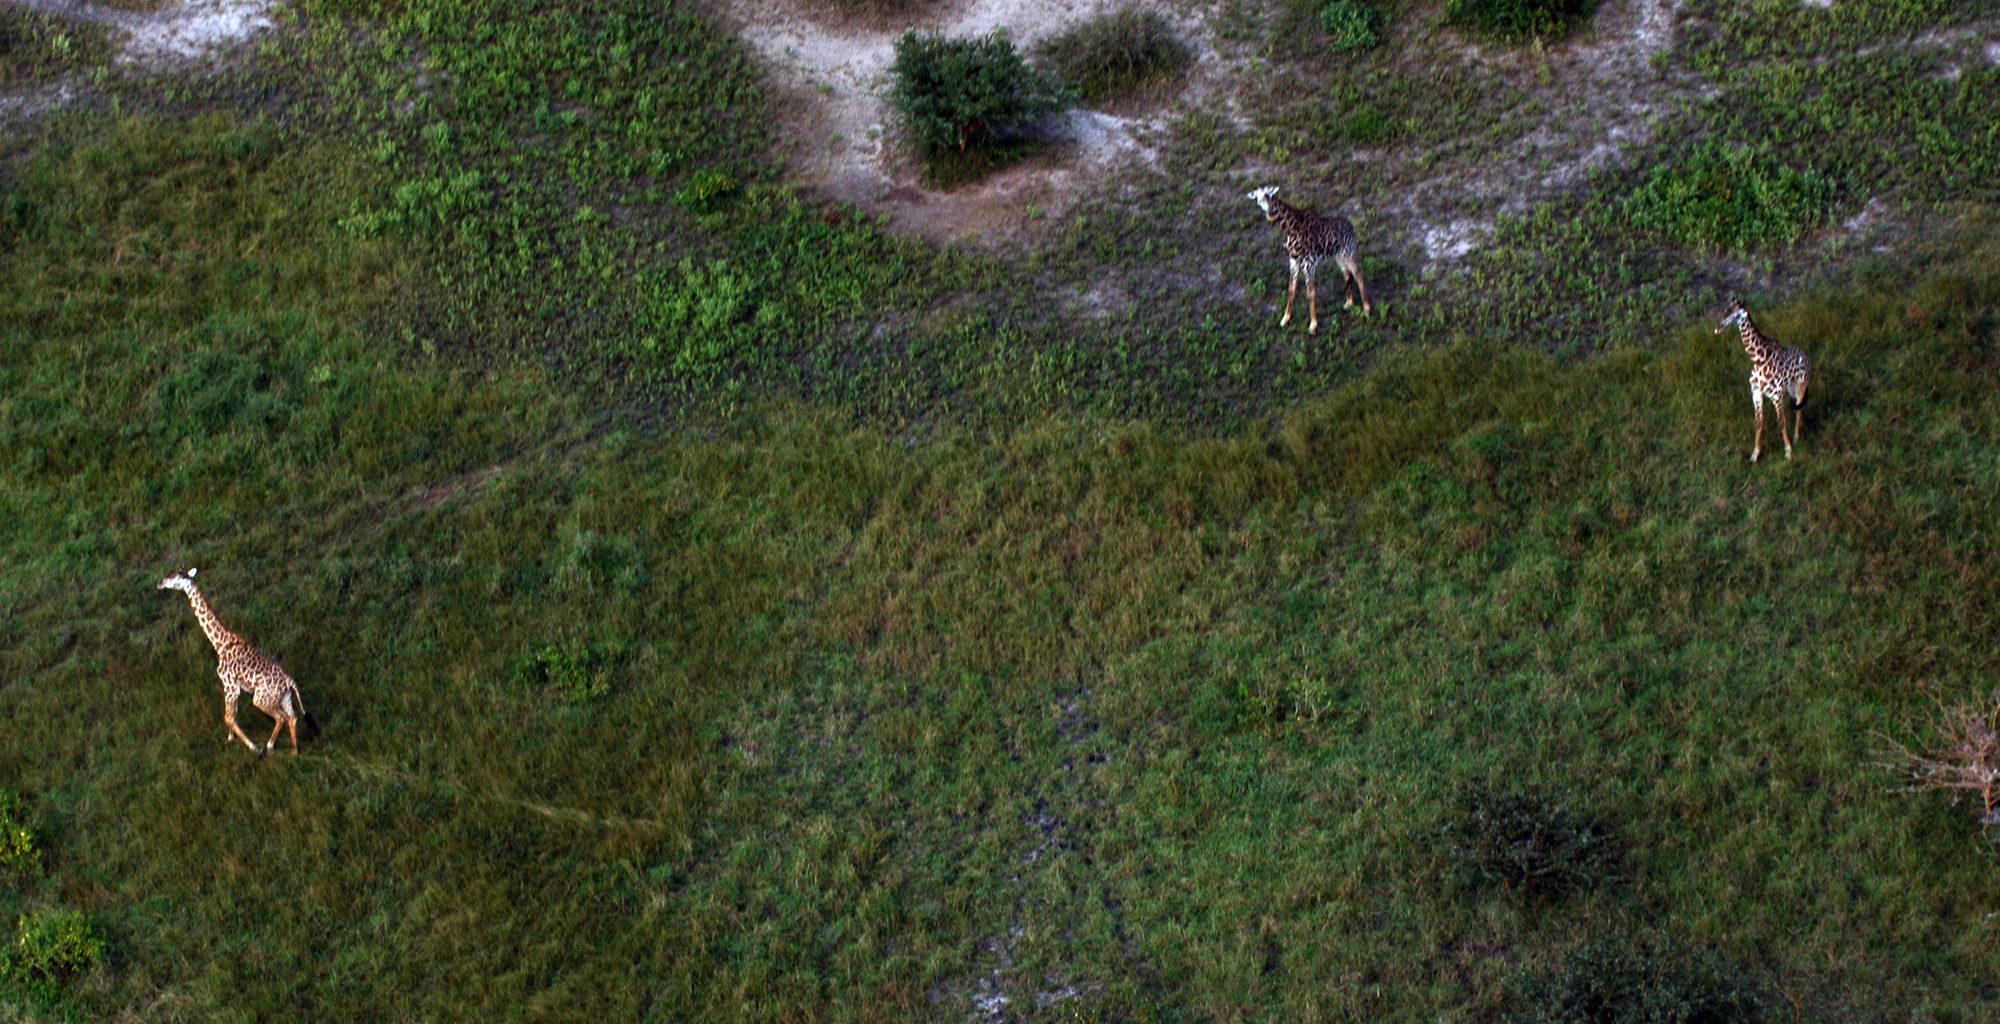 Tanzania-Mainland-Coast-Giraffe